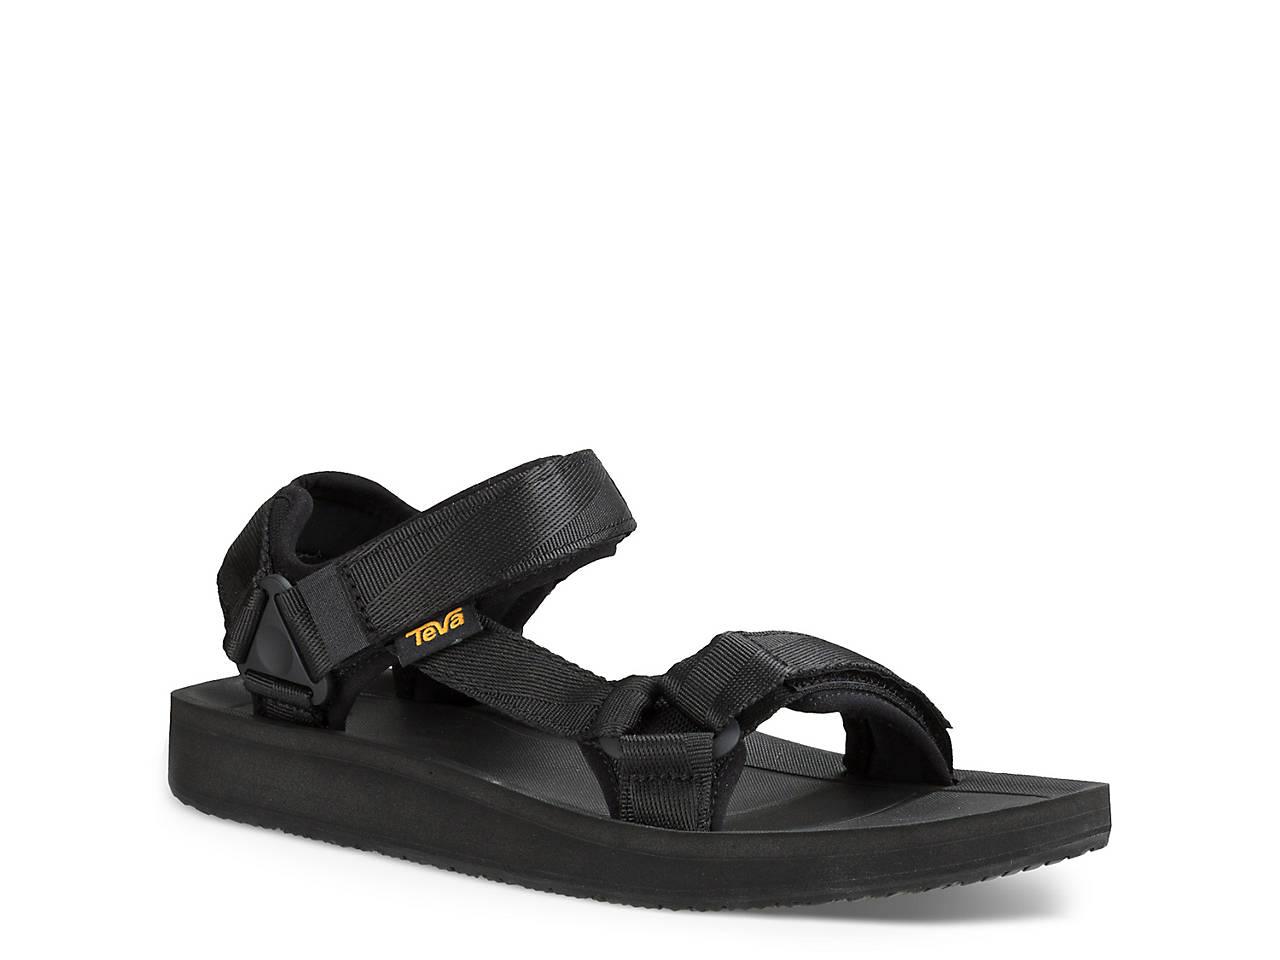 1e1108bf8 Teva Original Universal Premier Sandal Men s Shoes